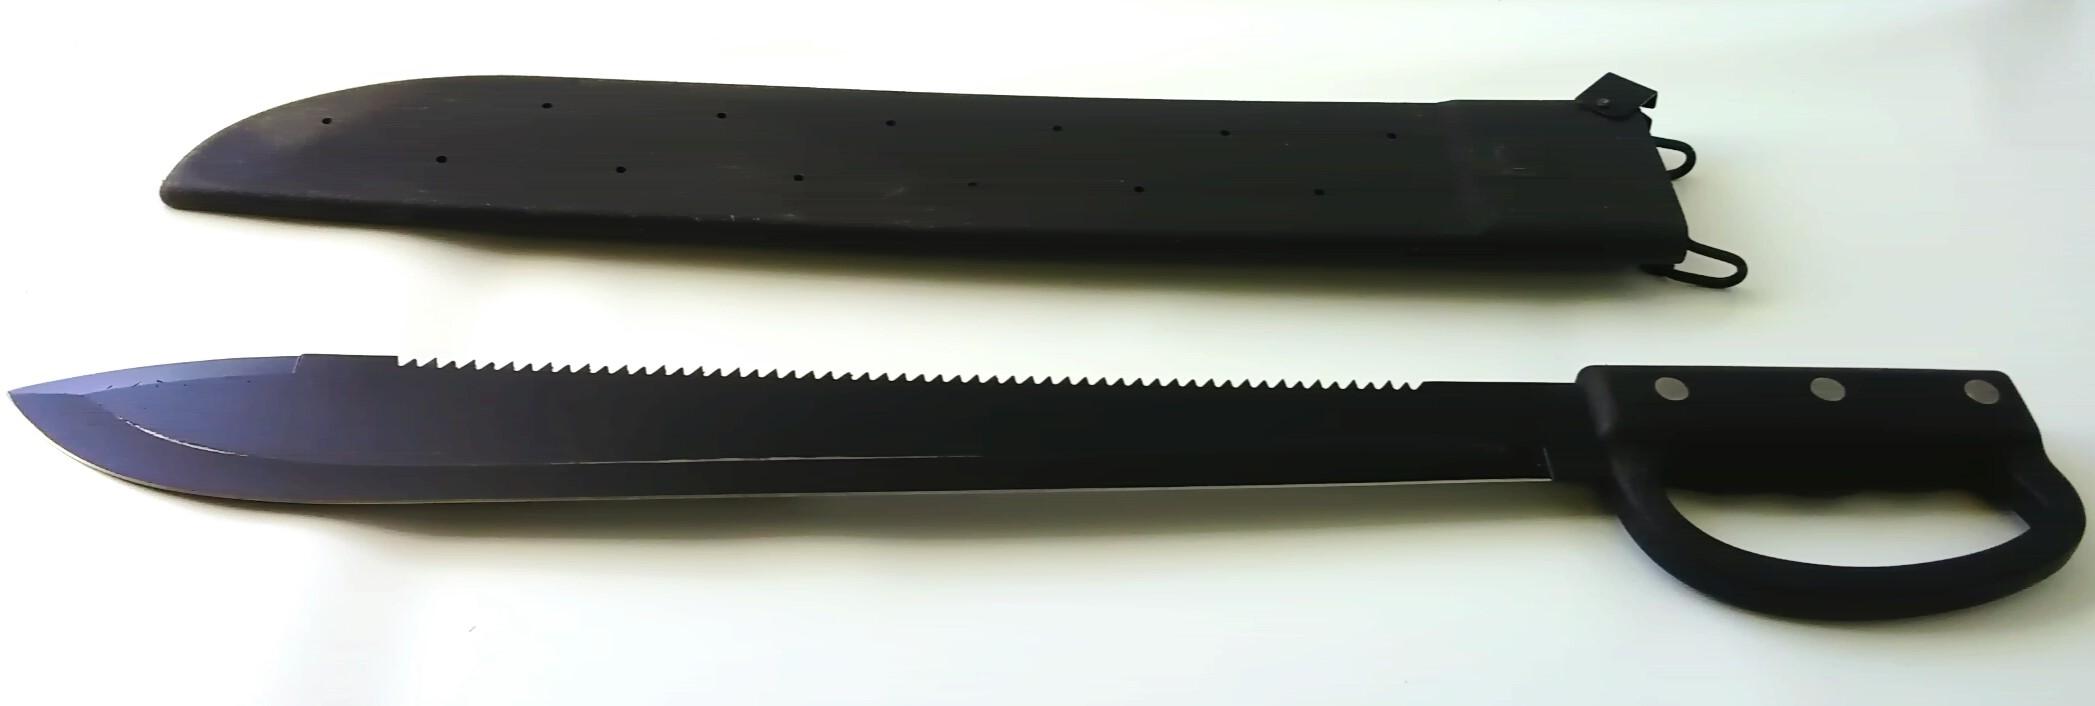 U.S. style machete with hand guard (12020)